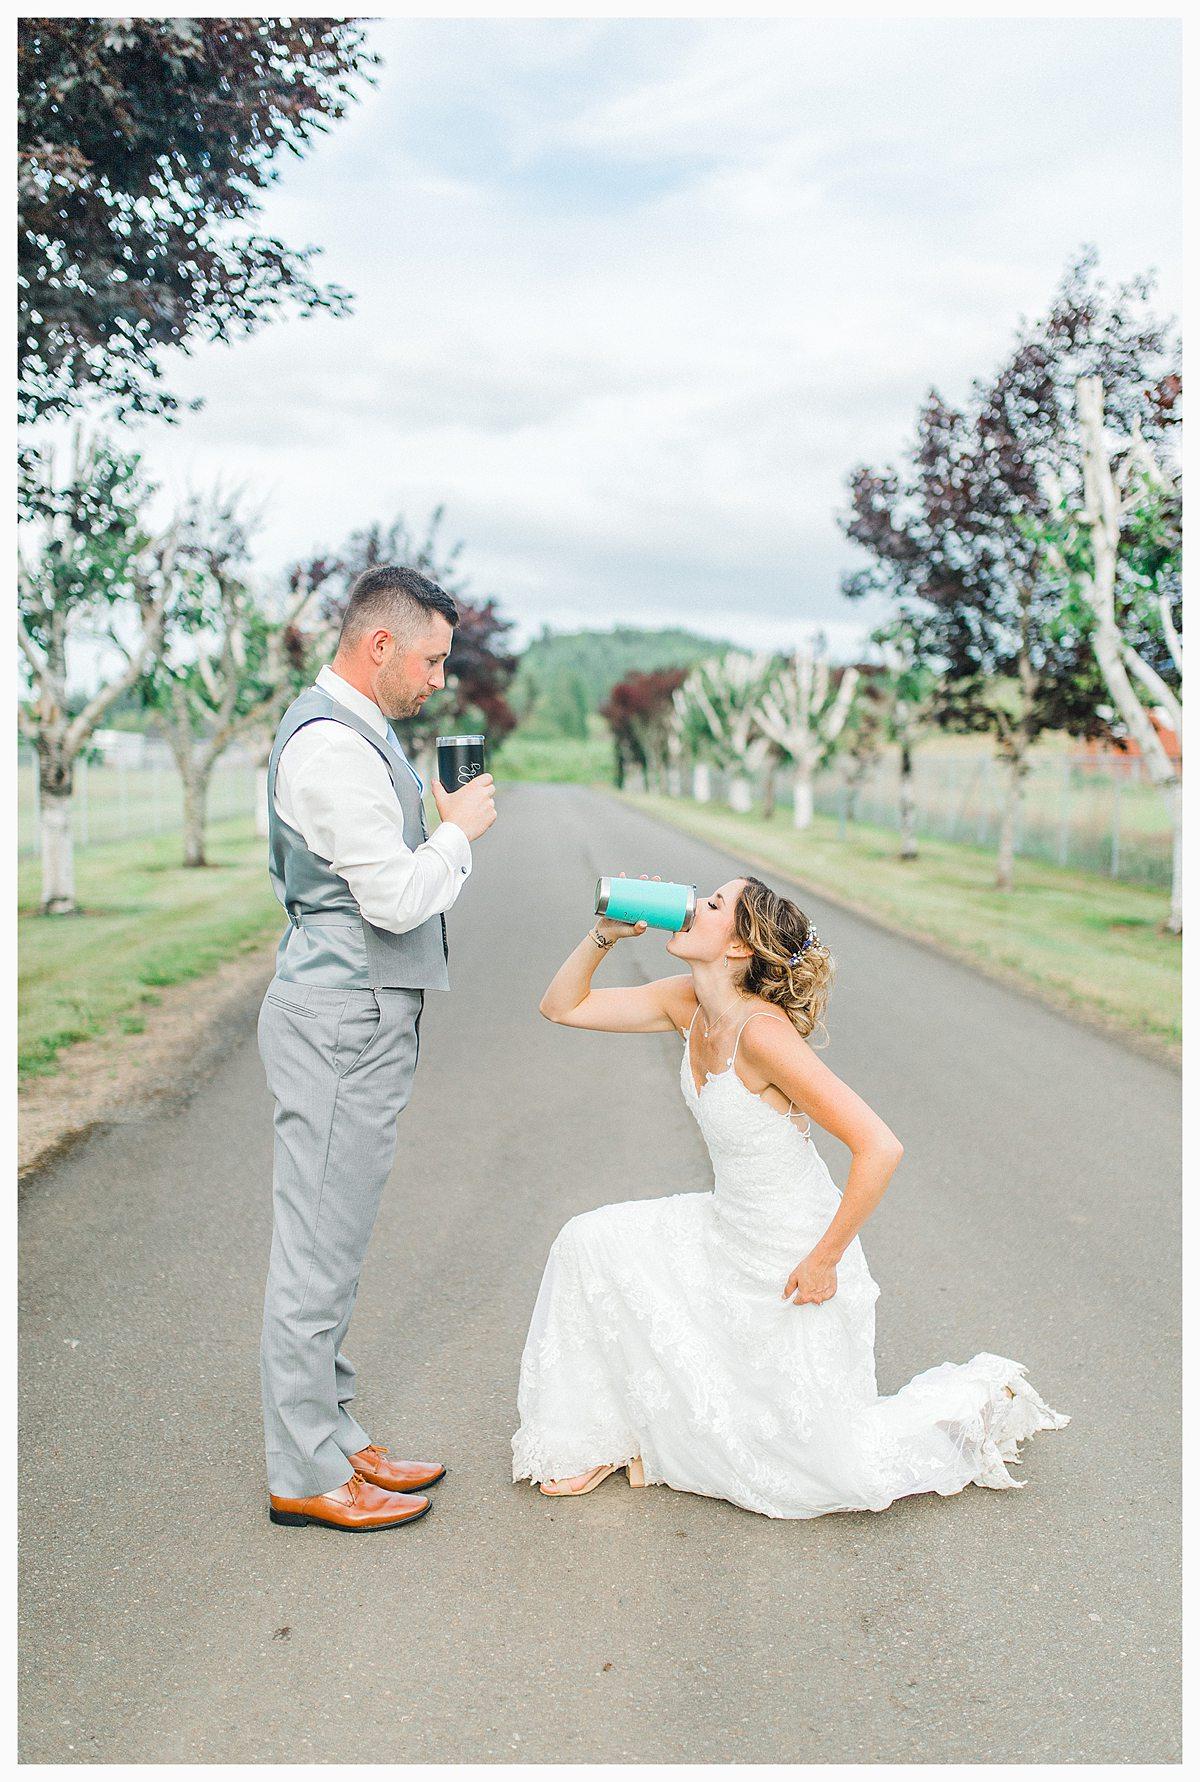 Rustic Coastal Blue Wedding in Southwest Washington, Emma Rose Company, Seattle and Portland Wedding Photographer, Light and Airy_0133.jpg